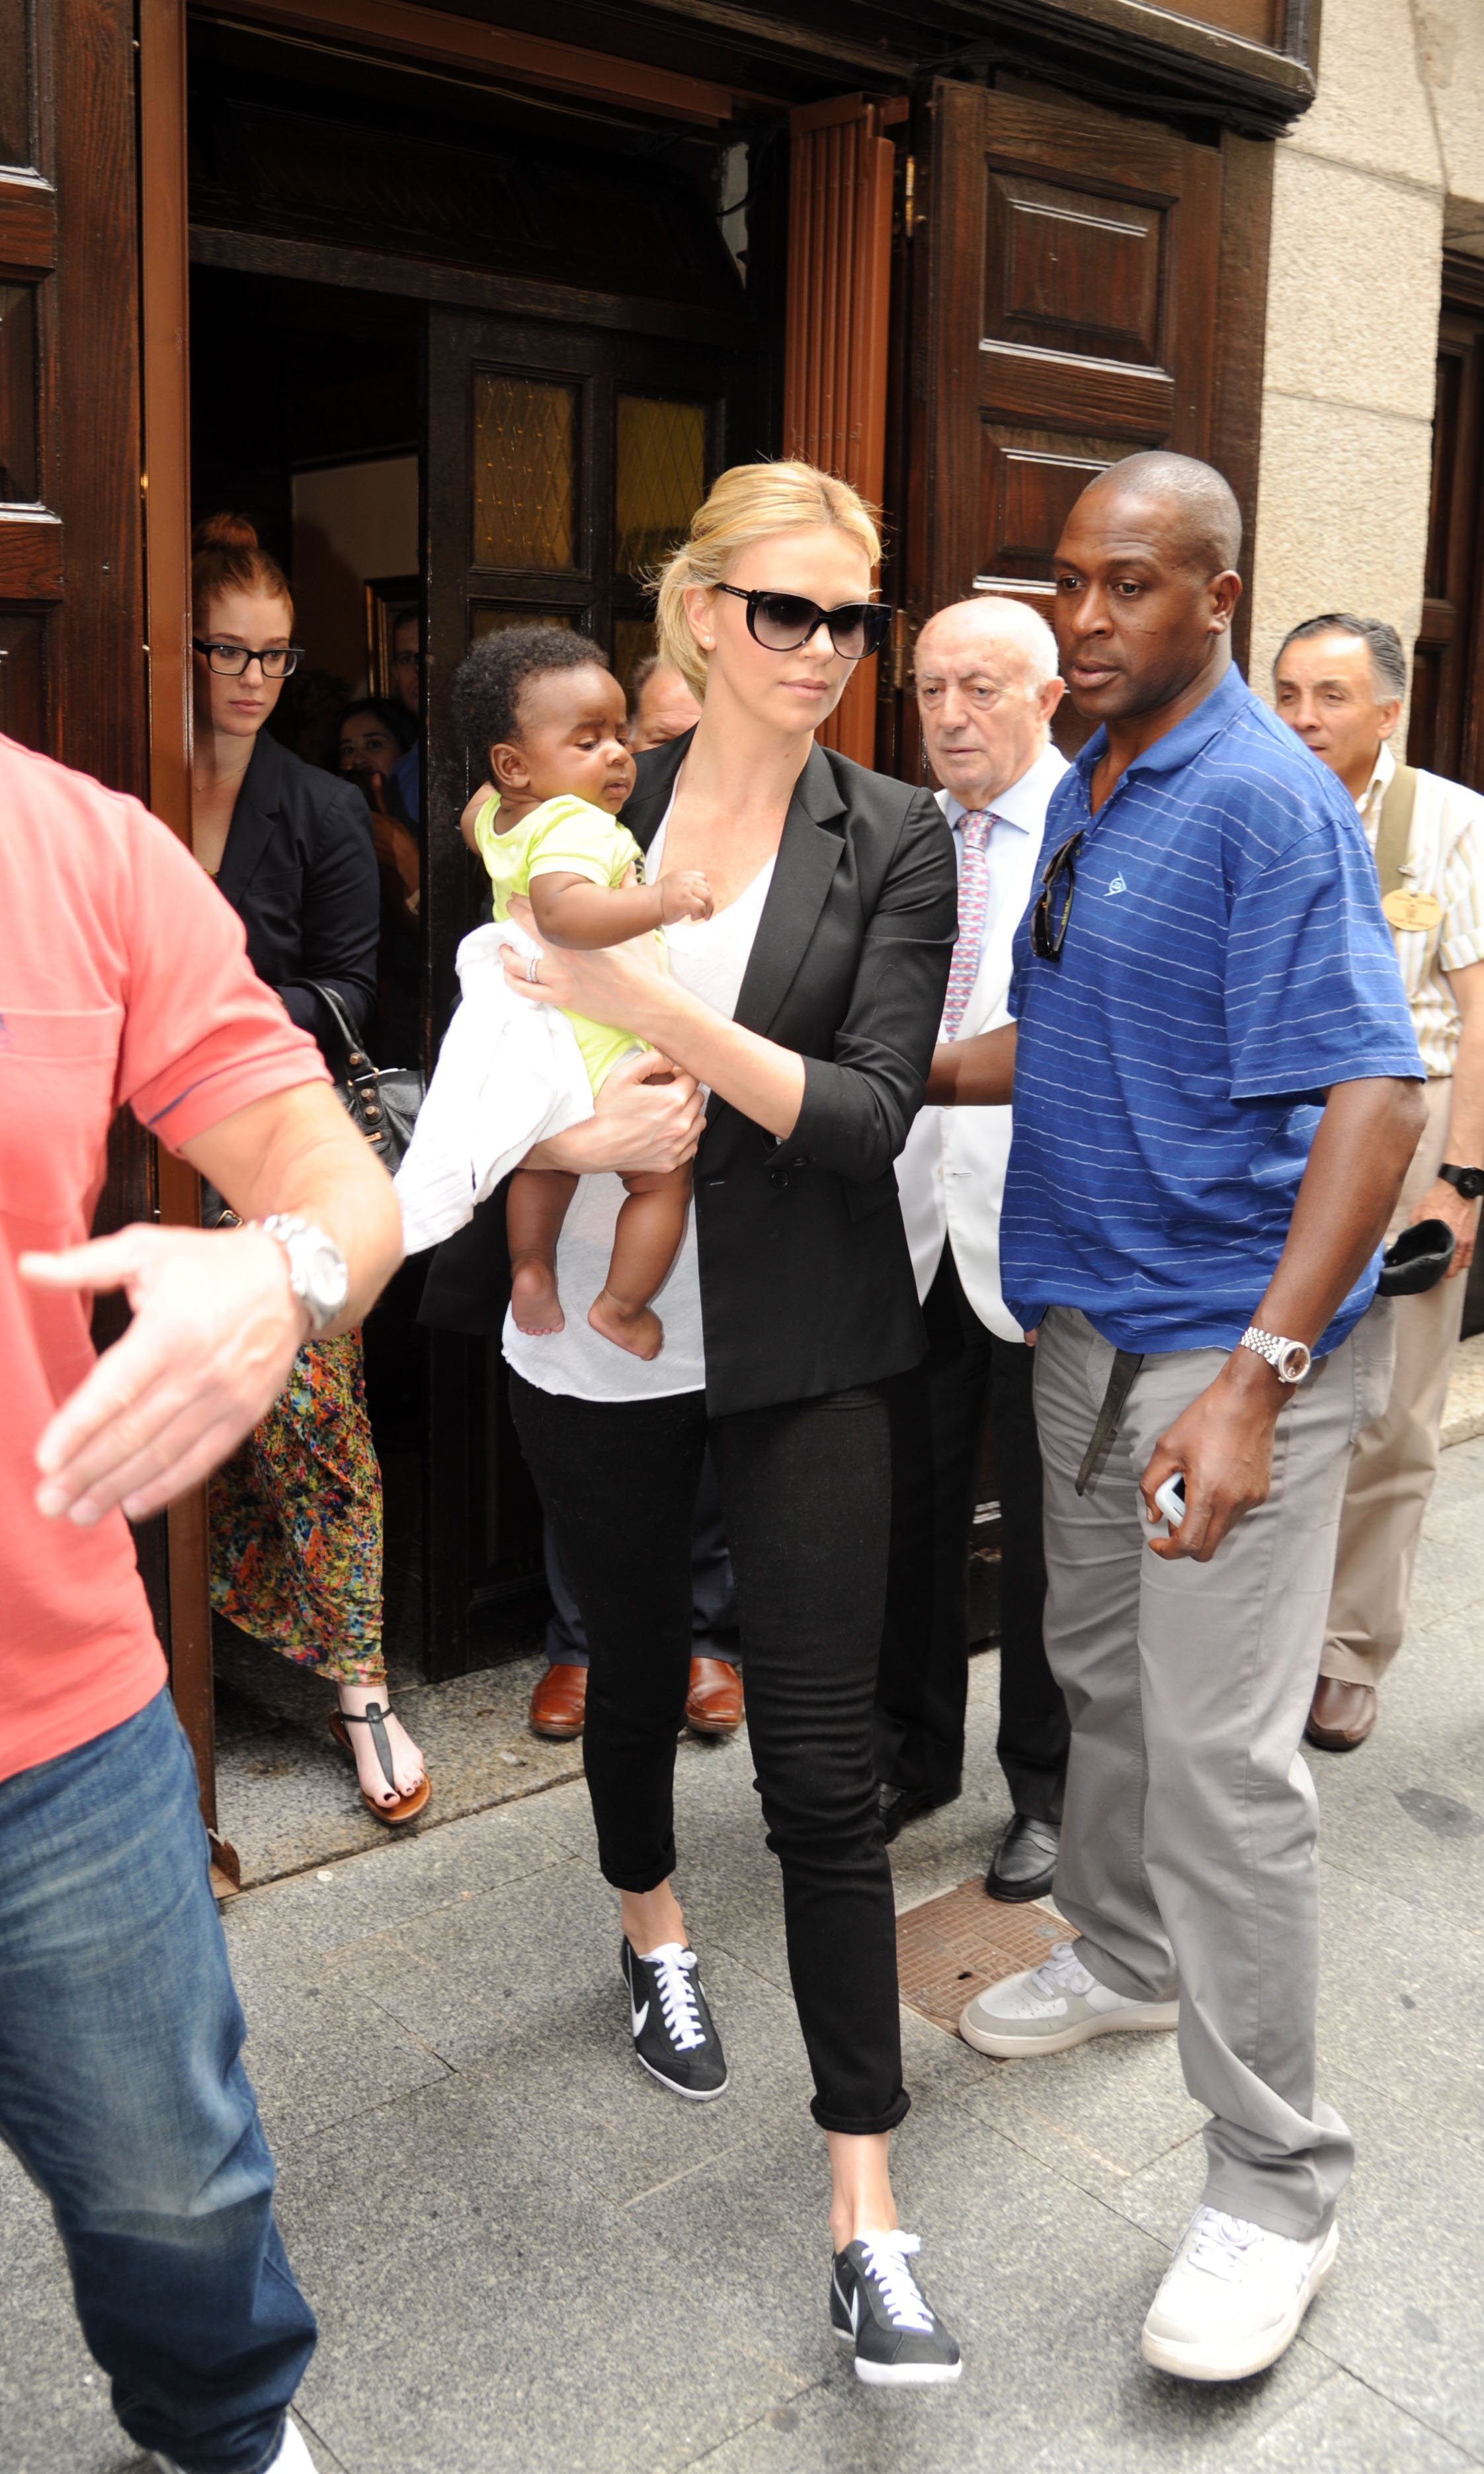 Why do celebrities adopt black babies